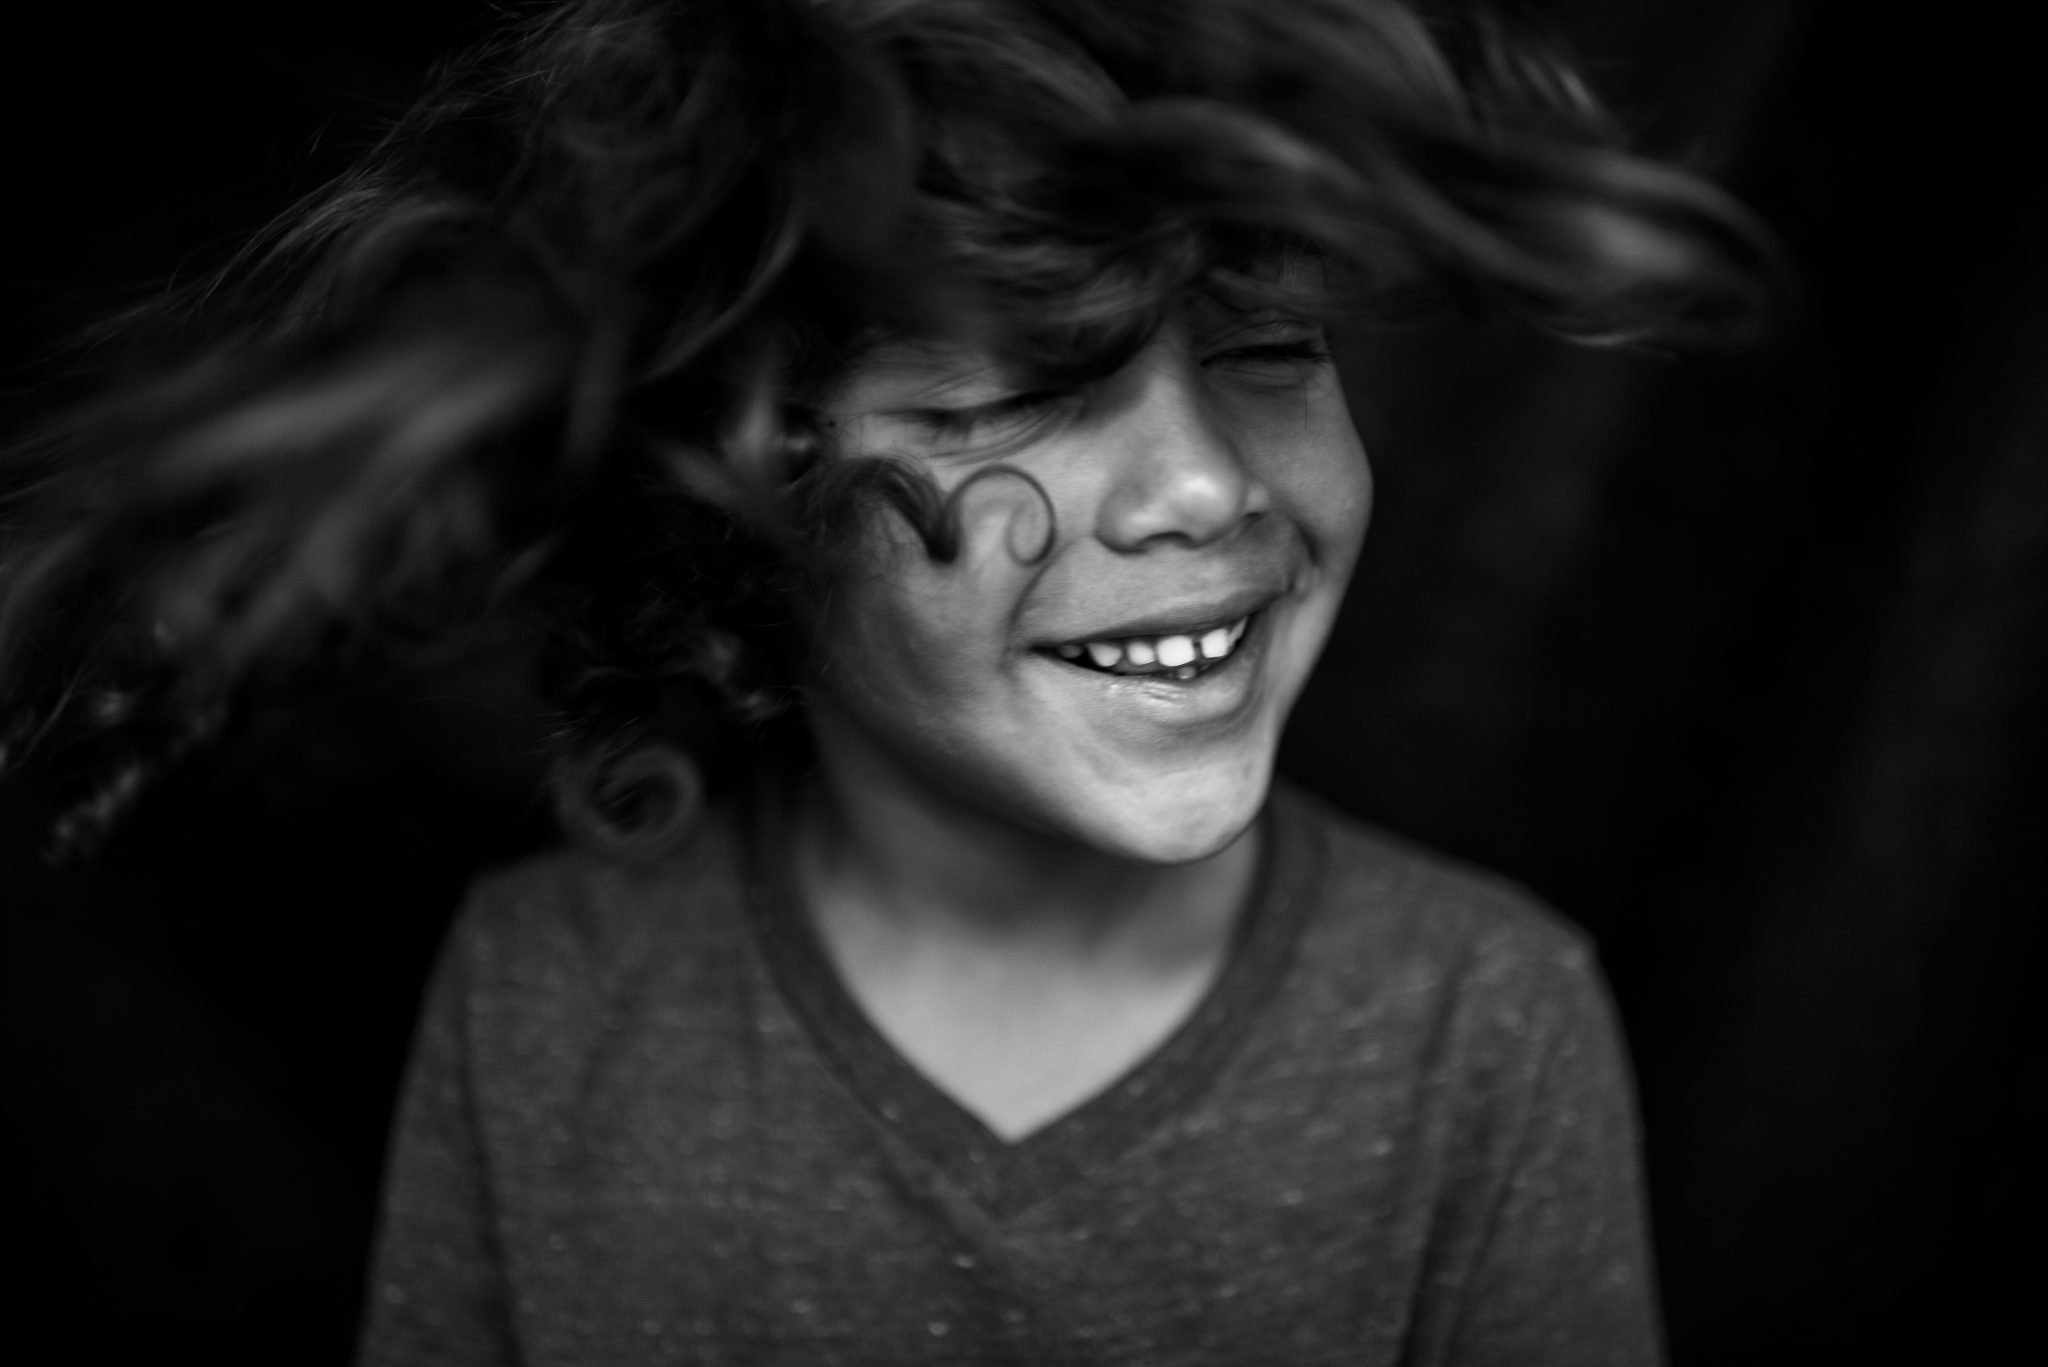 childrens_kids_Back_to_school_portraits_1